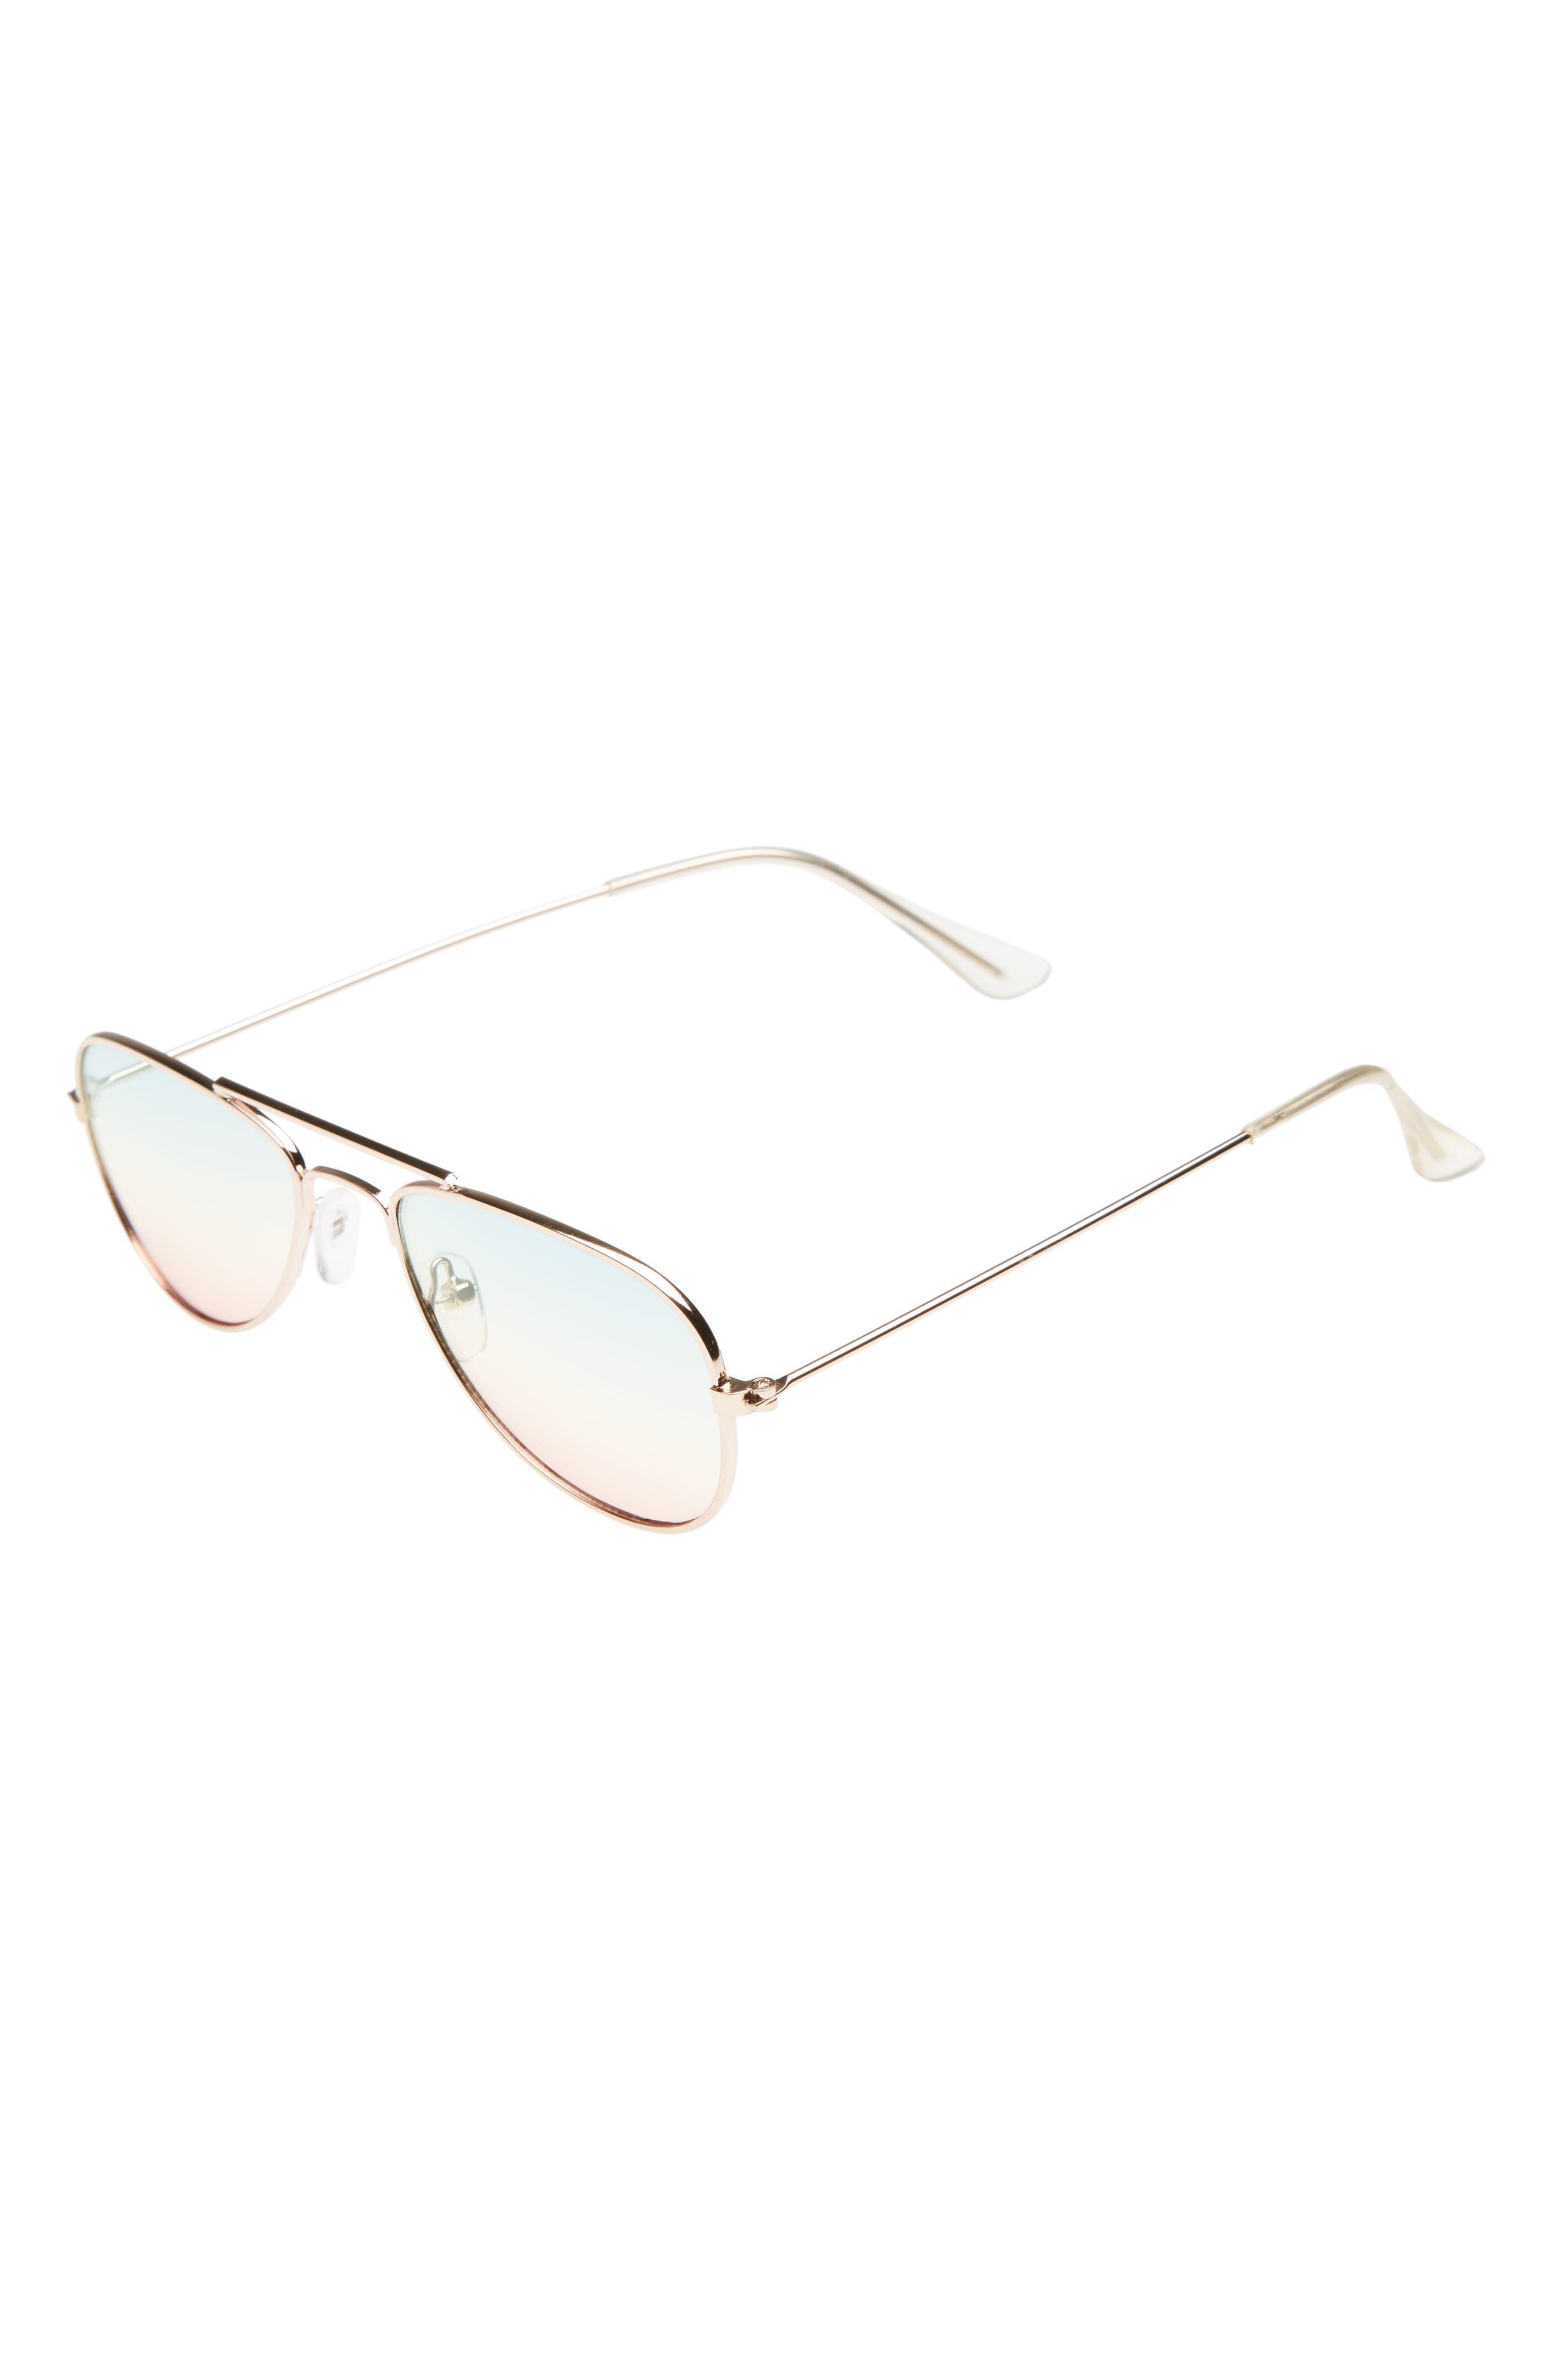 Rainbow Aviator Sunglasses,                         Main,                         color, Gold